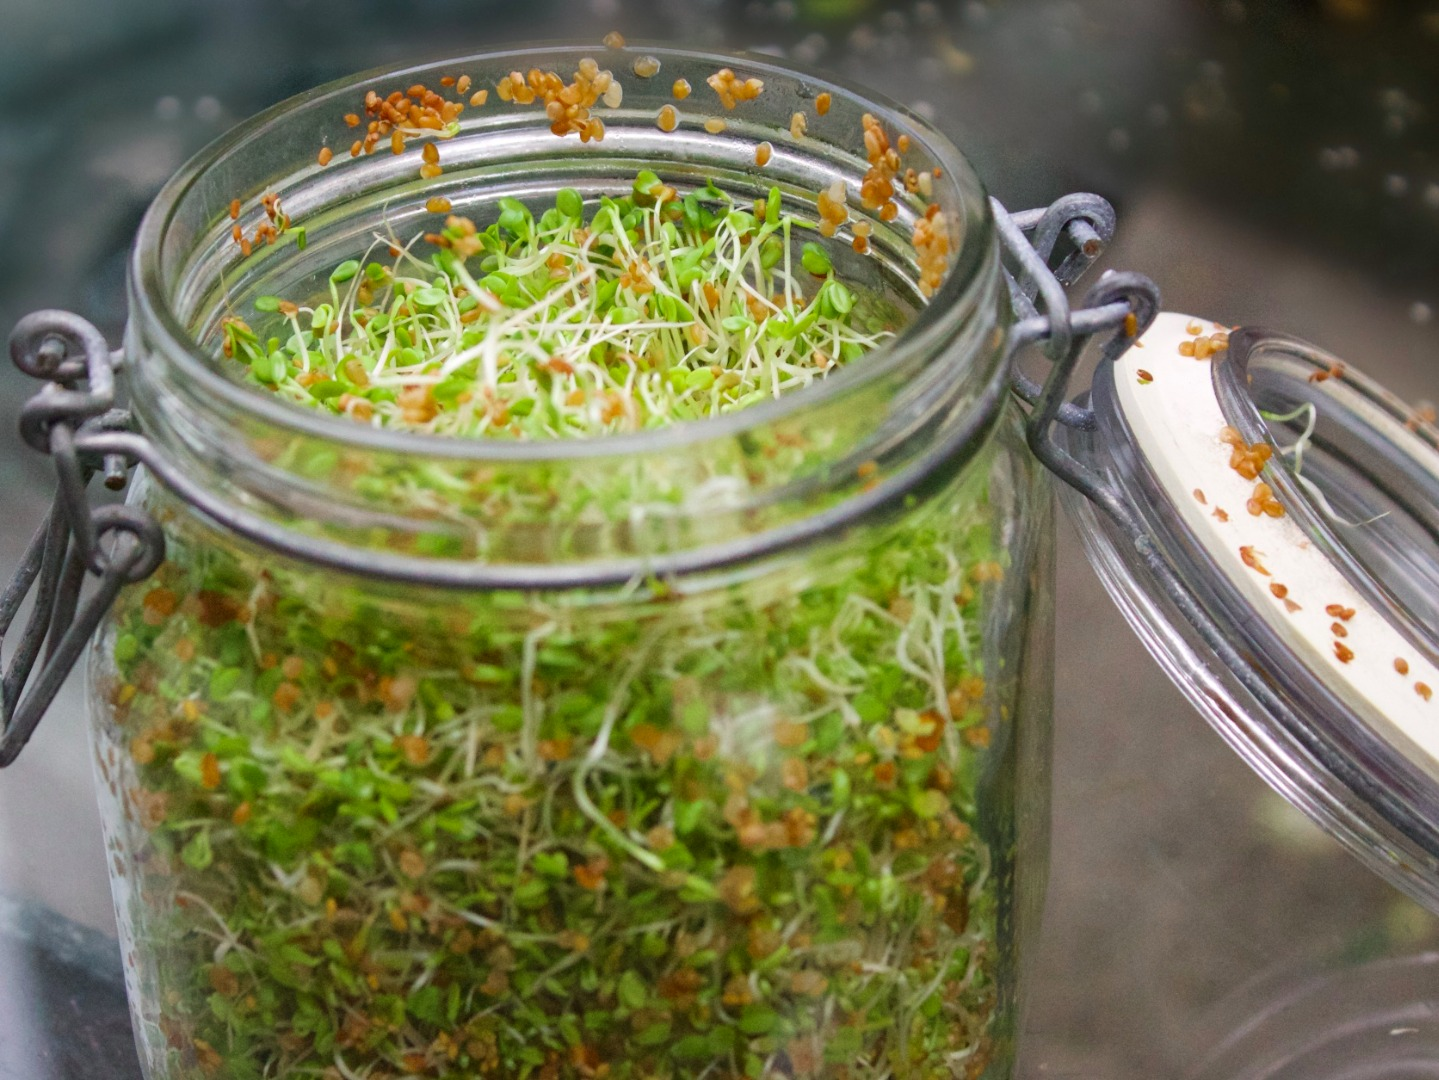 Picture of 36 Cool Indoor Garden Ideas to Grow Food